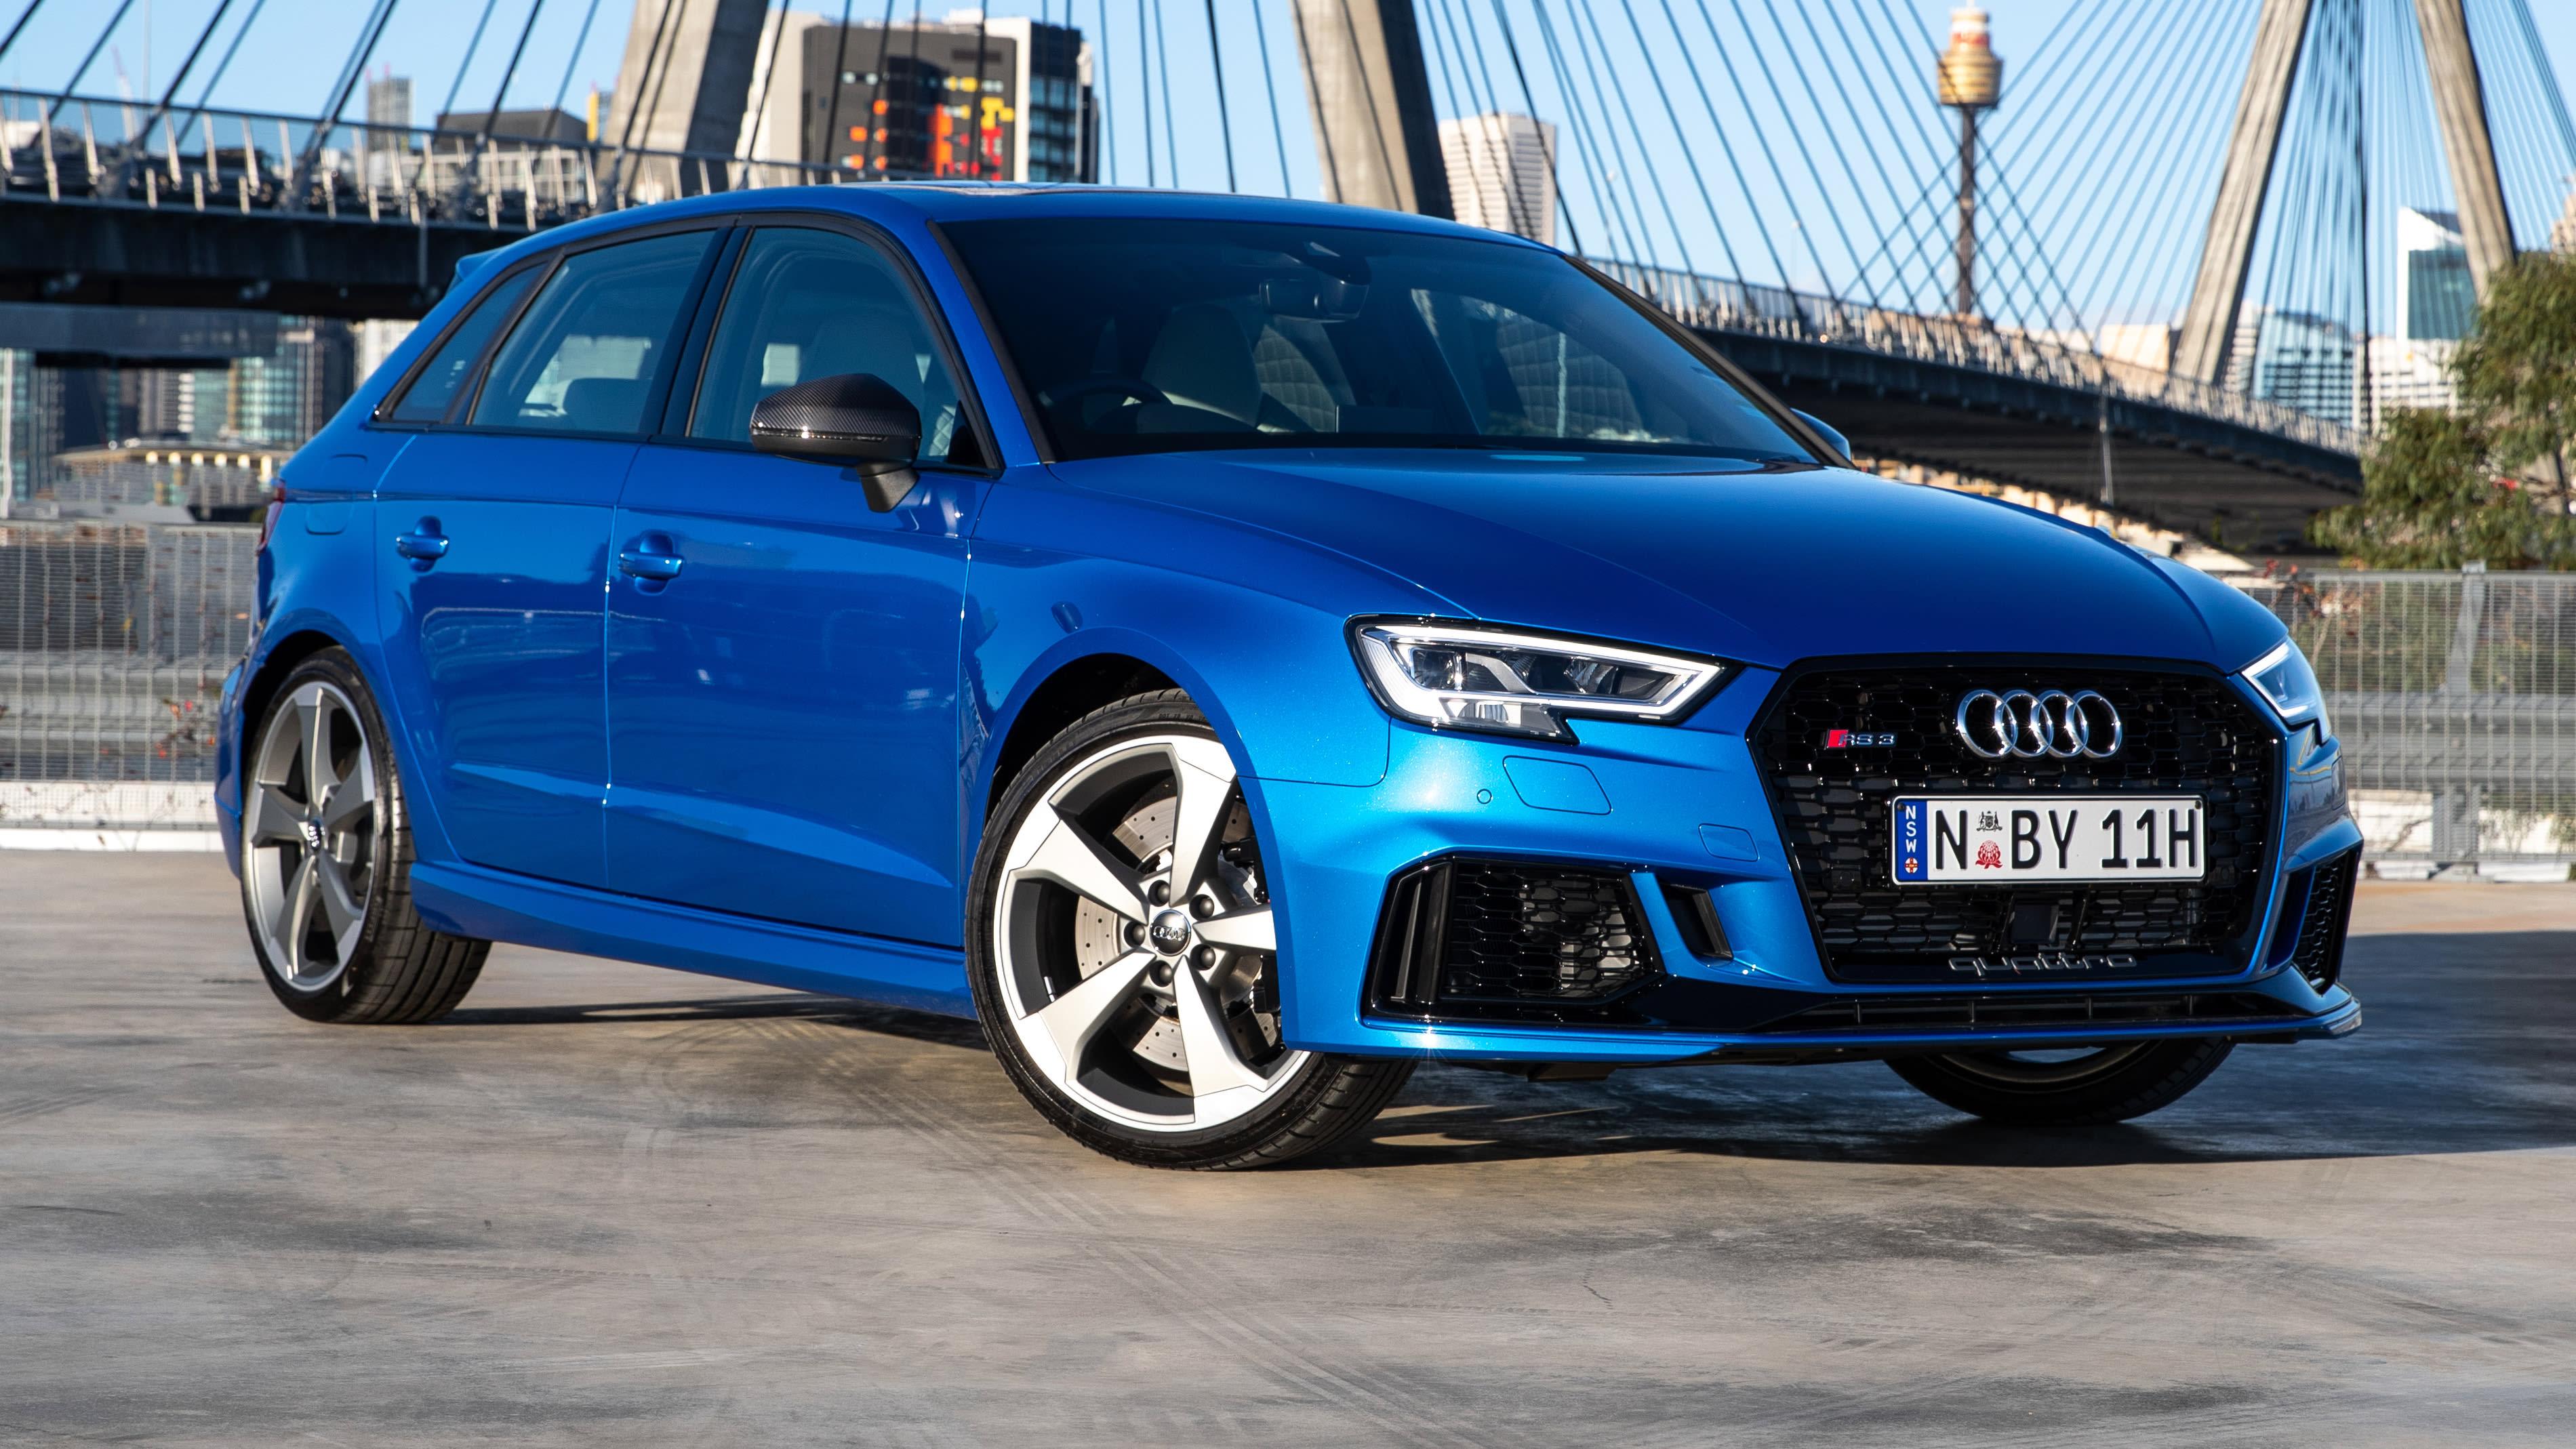 Kelebihan Kekurangan Audi R3 Murah Berkualitas